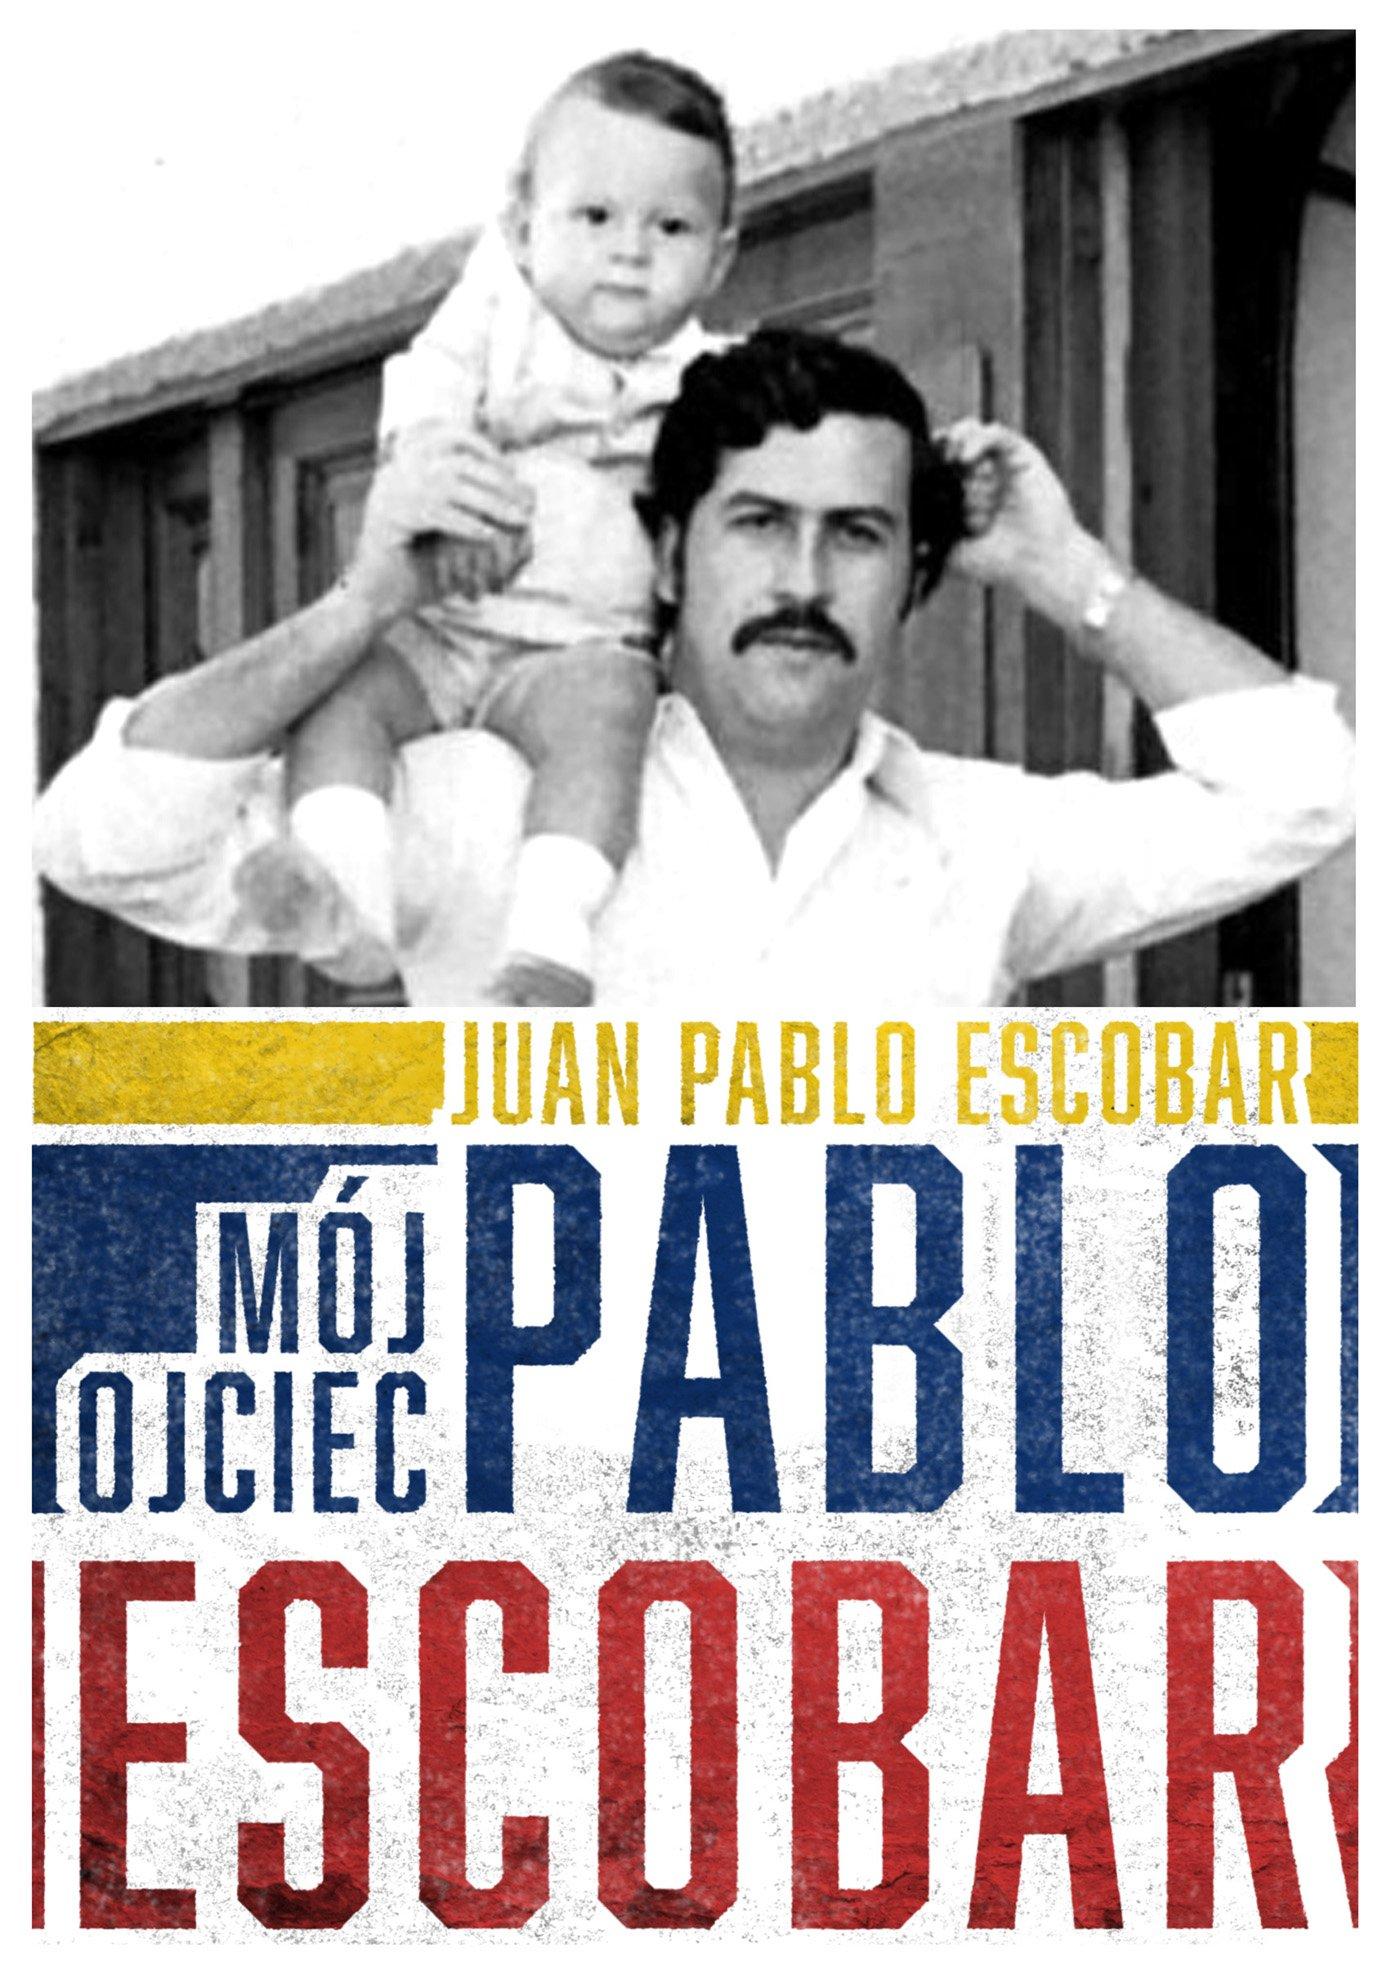 Mój ojciec Pablo Escobar - Ebook (Książka na Kindle) do pobrania w formacie MOBI